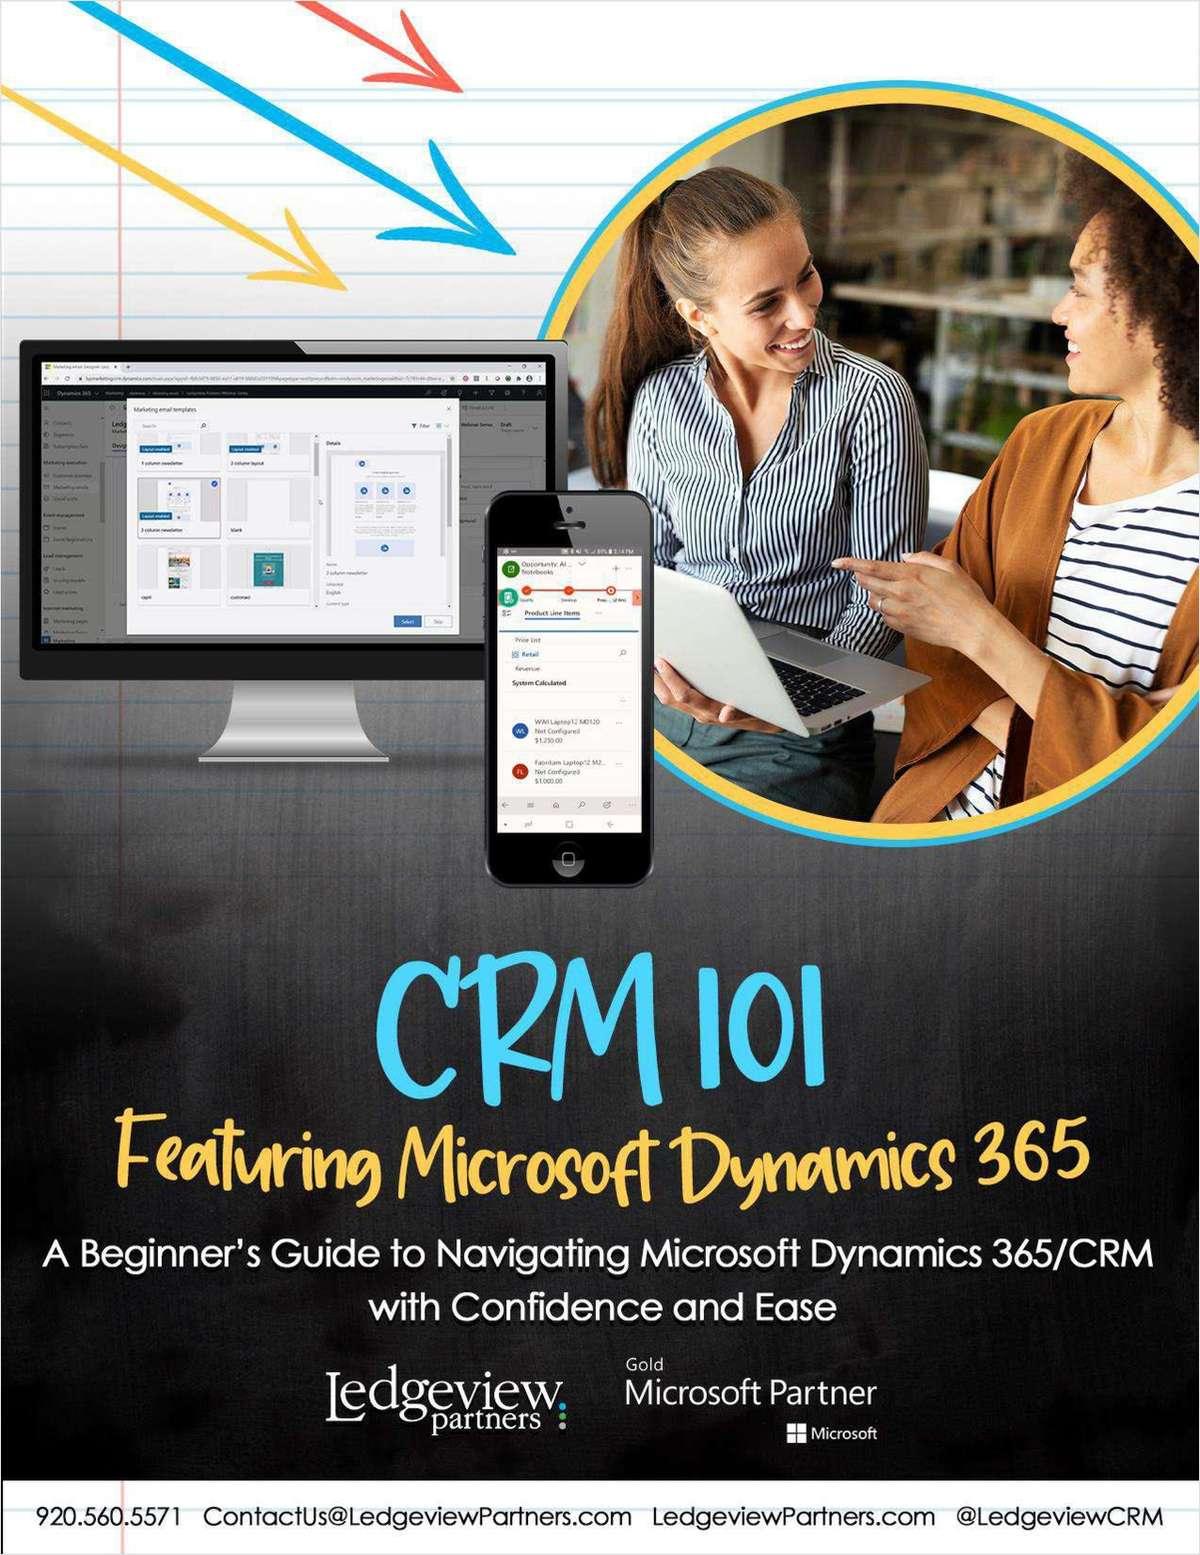 CRM 101 Featuring Microsoft Dynamics 365